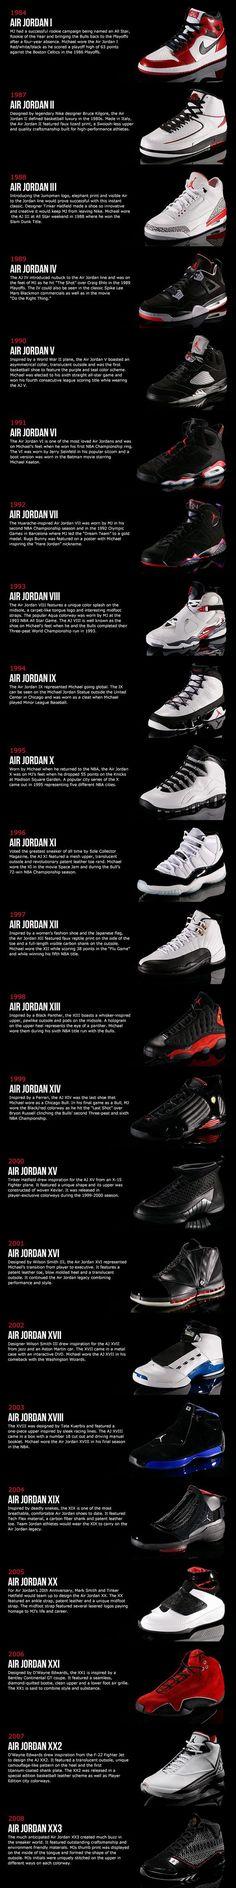 Air Jordan Retro Basketball Shoes Collection #amazonaffiliatelink Air Jordan Basketball Shoes, Basketball Sneakers, Air Jordan Shoes, Nike Basketball, All Jordans, Nike Air Jordans, Retro Jordans, Jordan Shoe Box Storage, Classic Nike Shoes